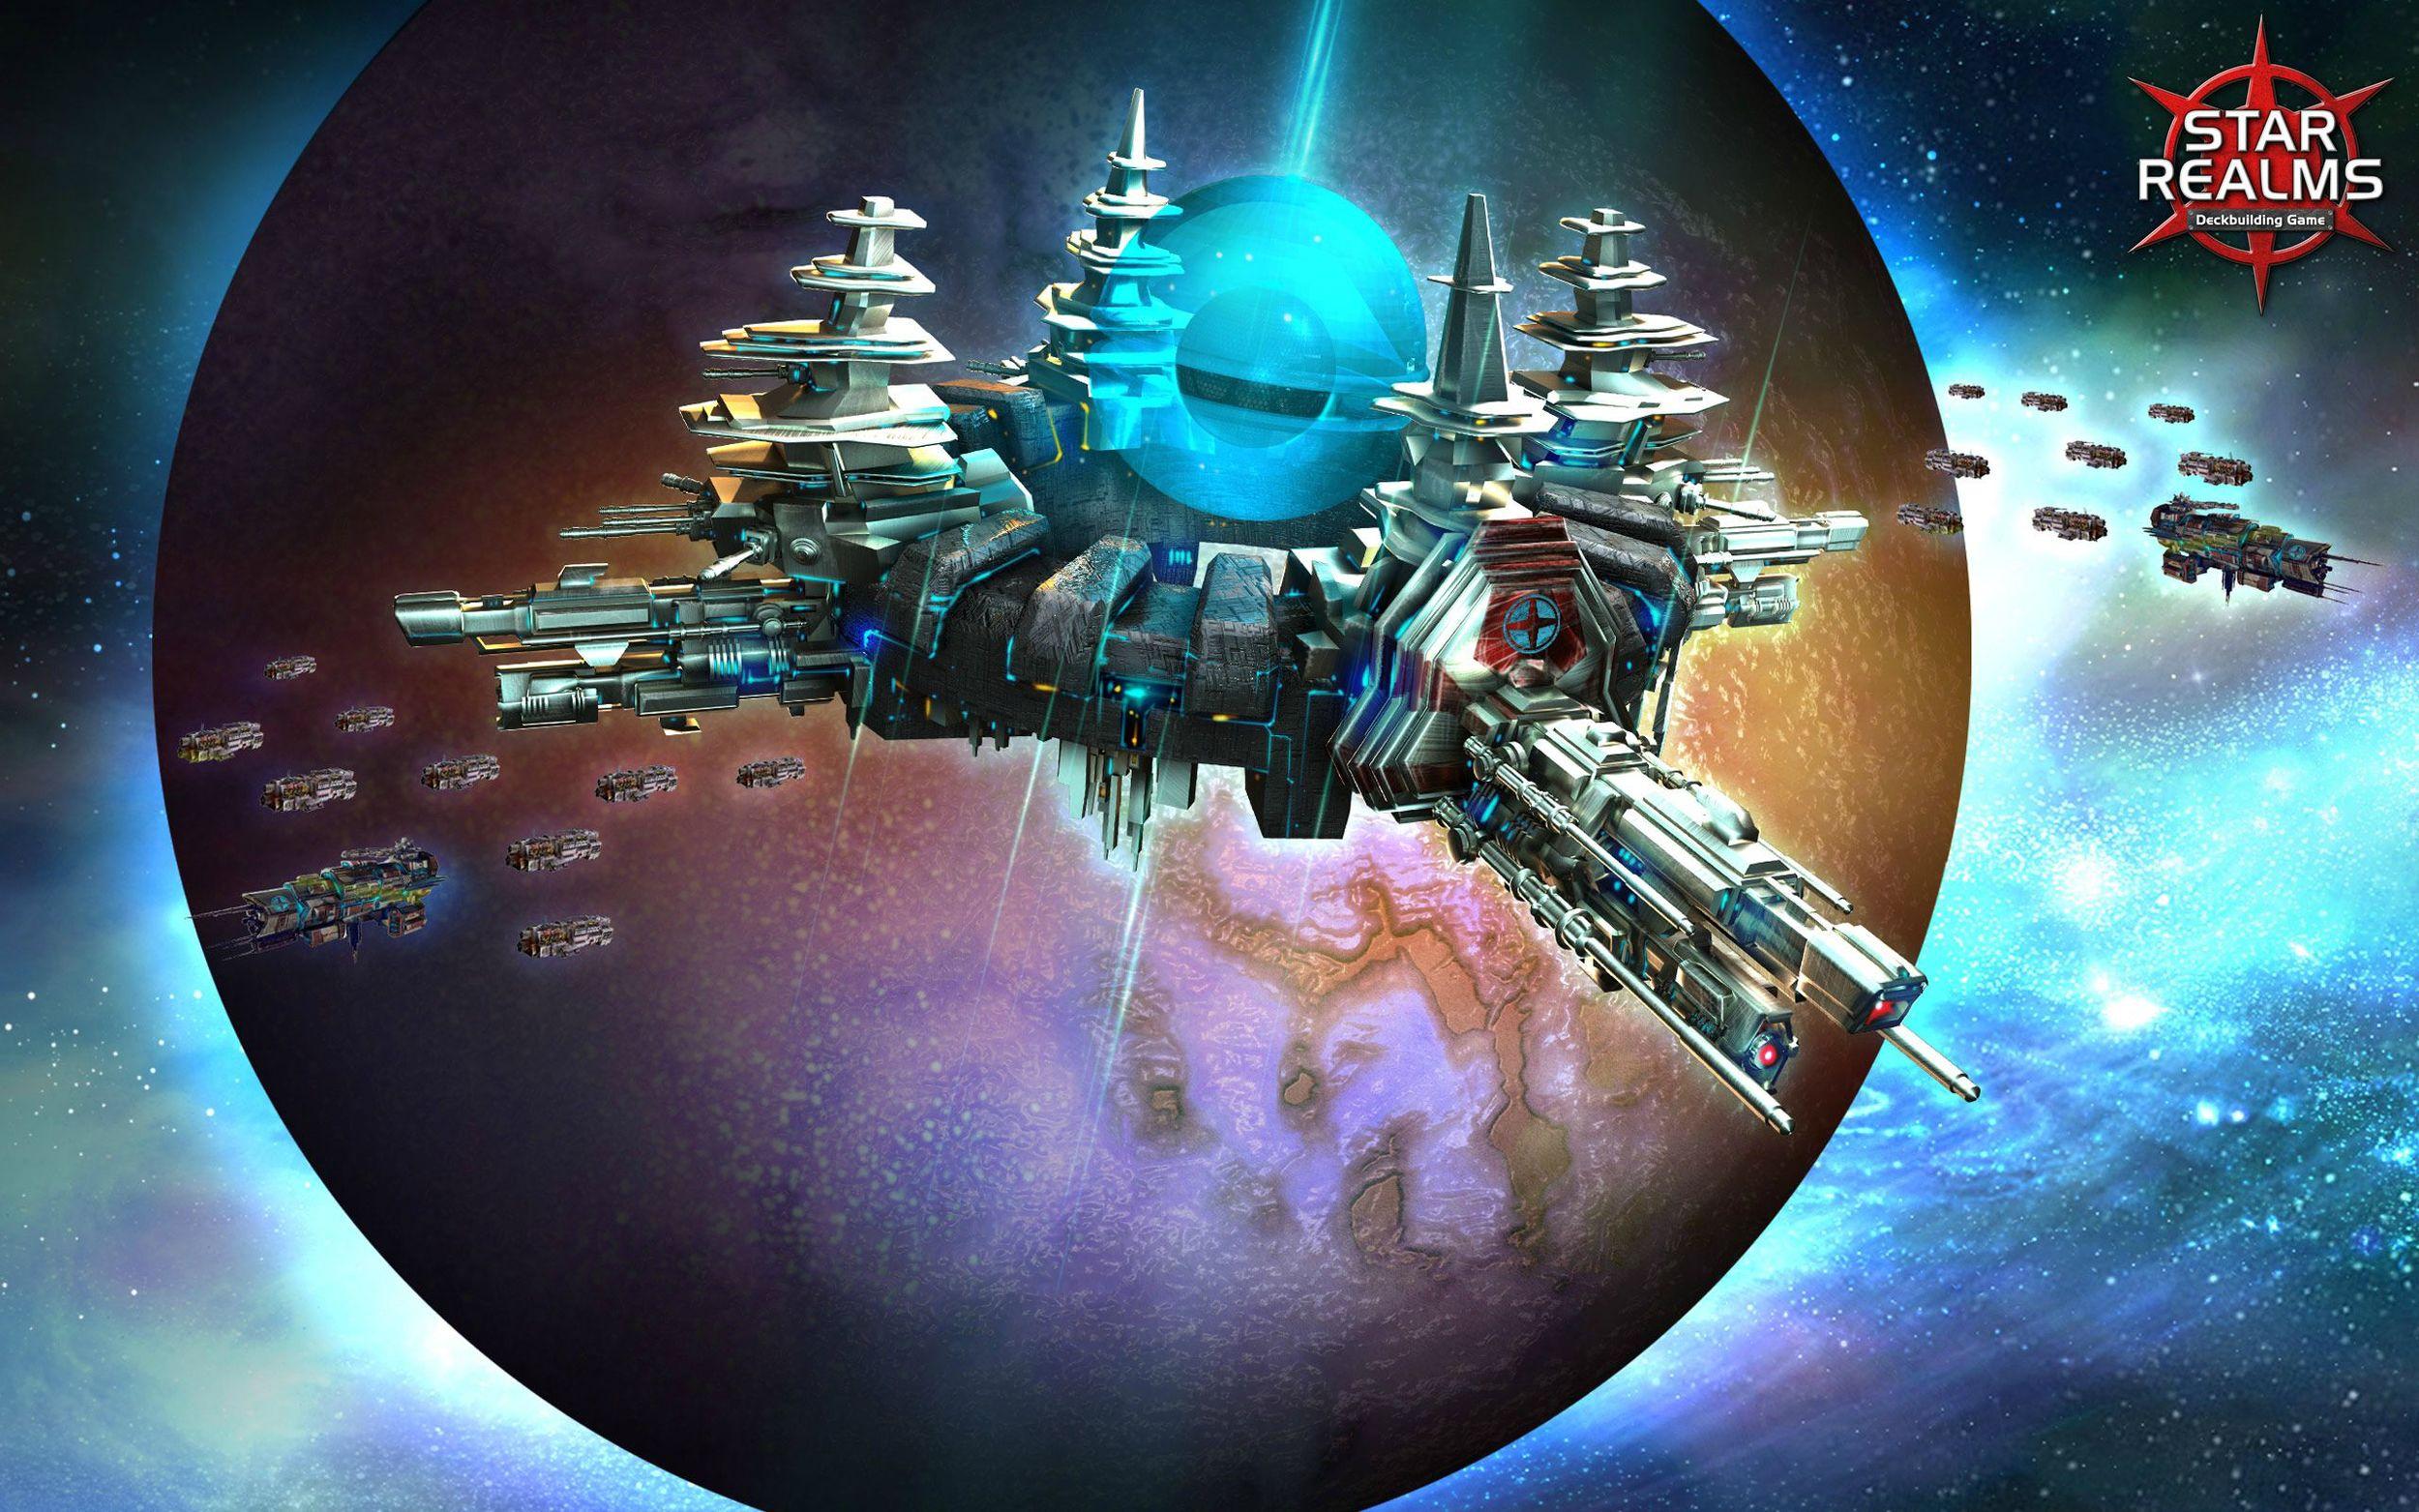 Star Realms has amazing art.